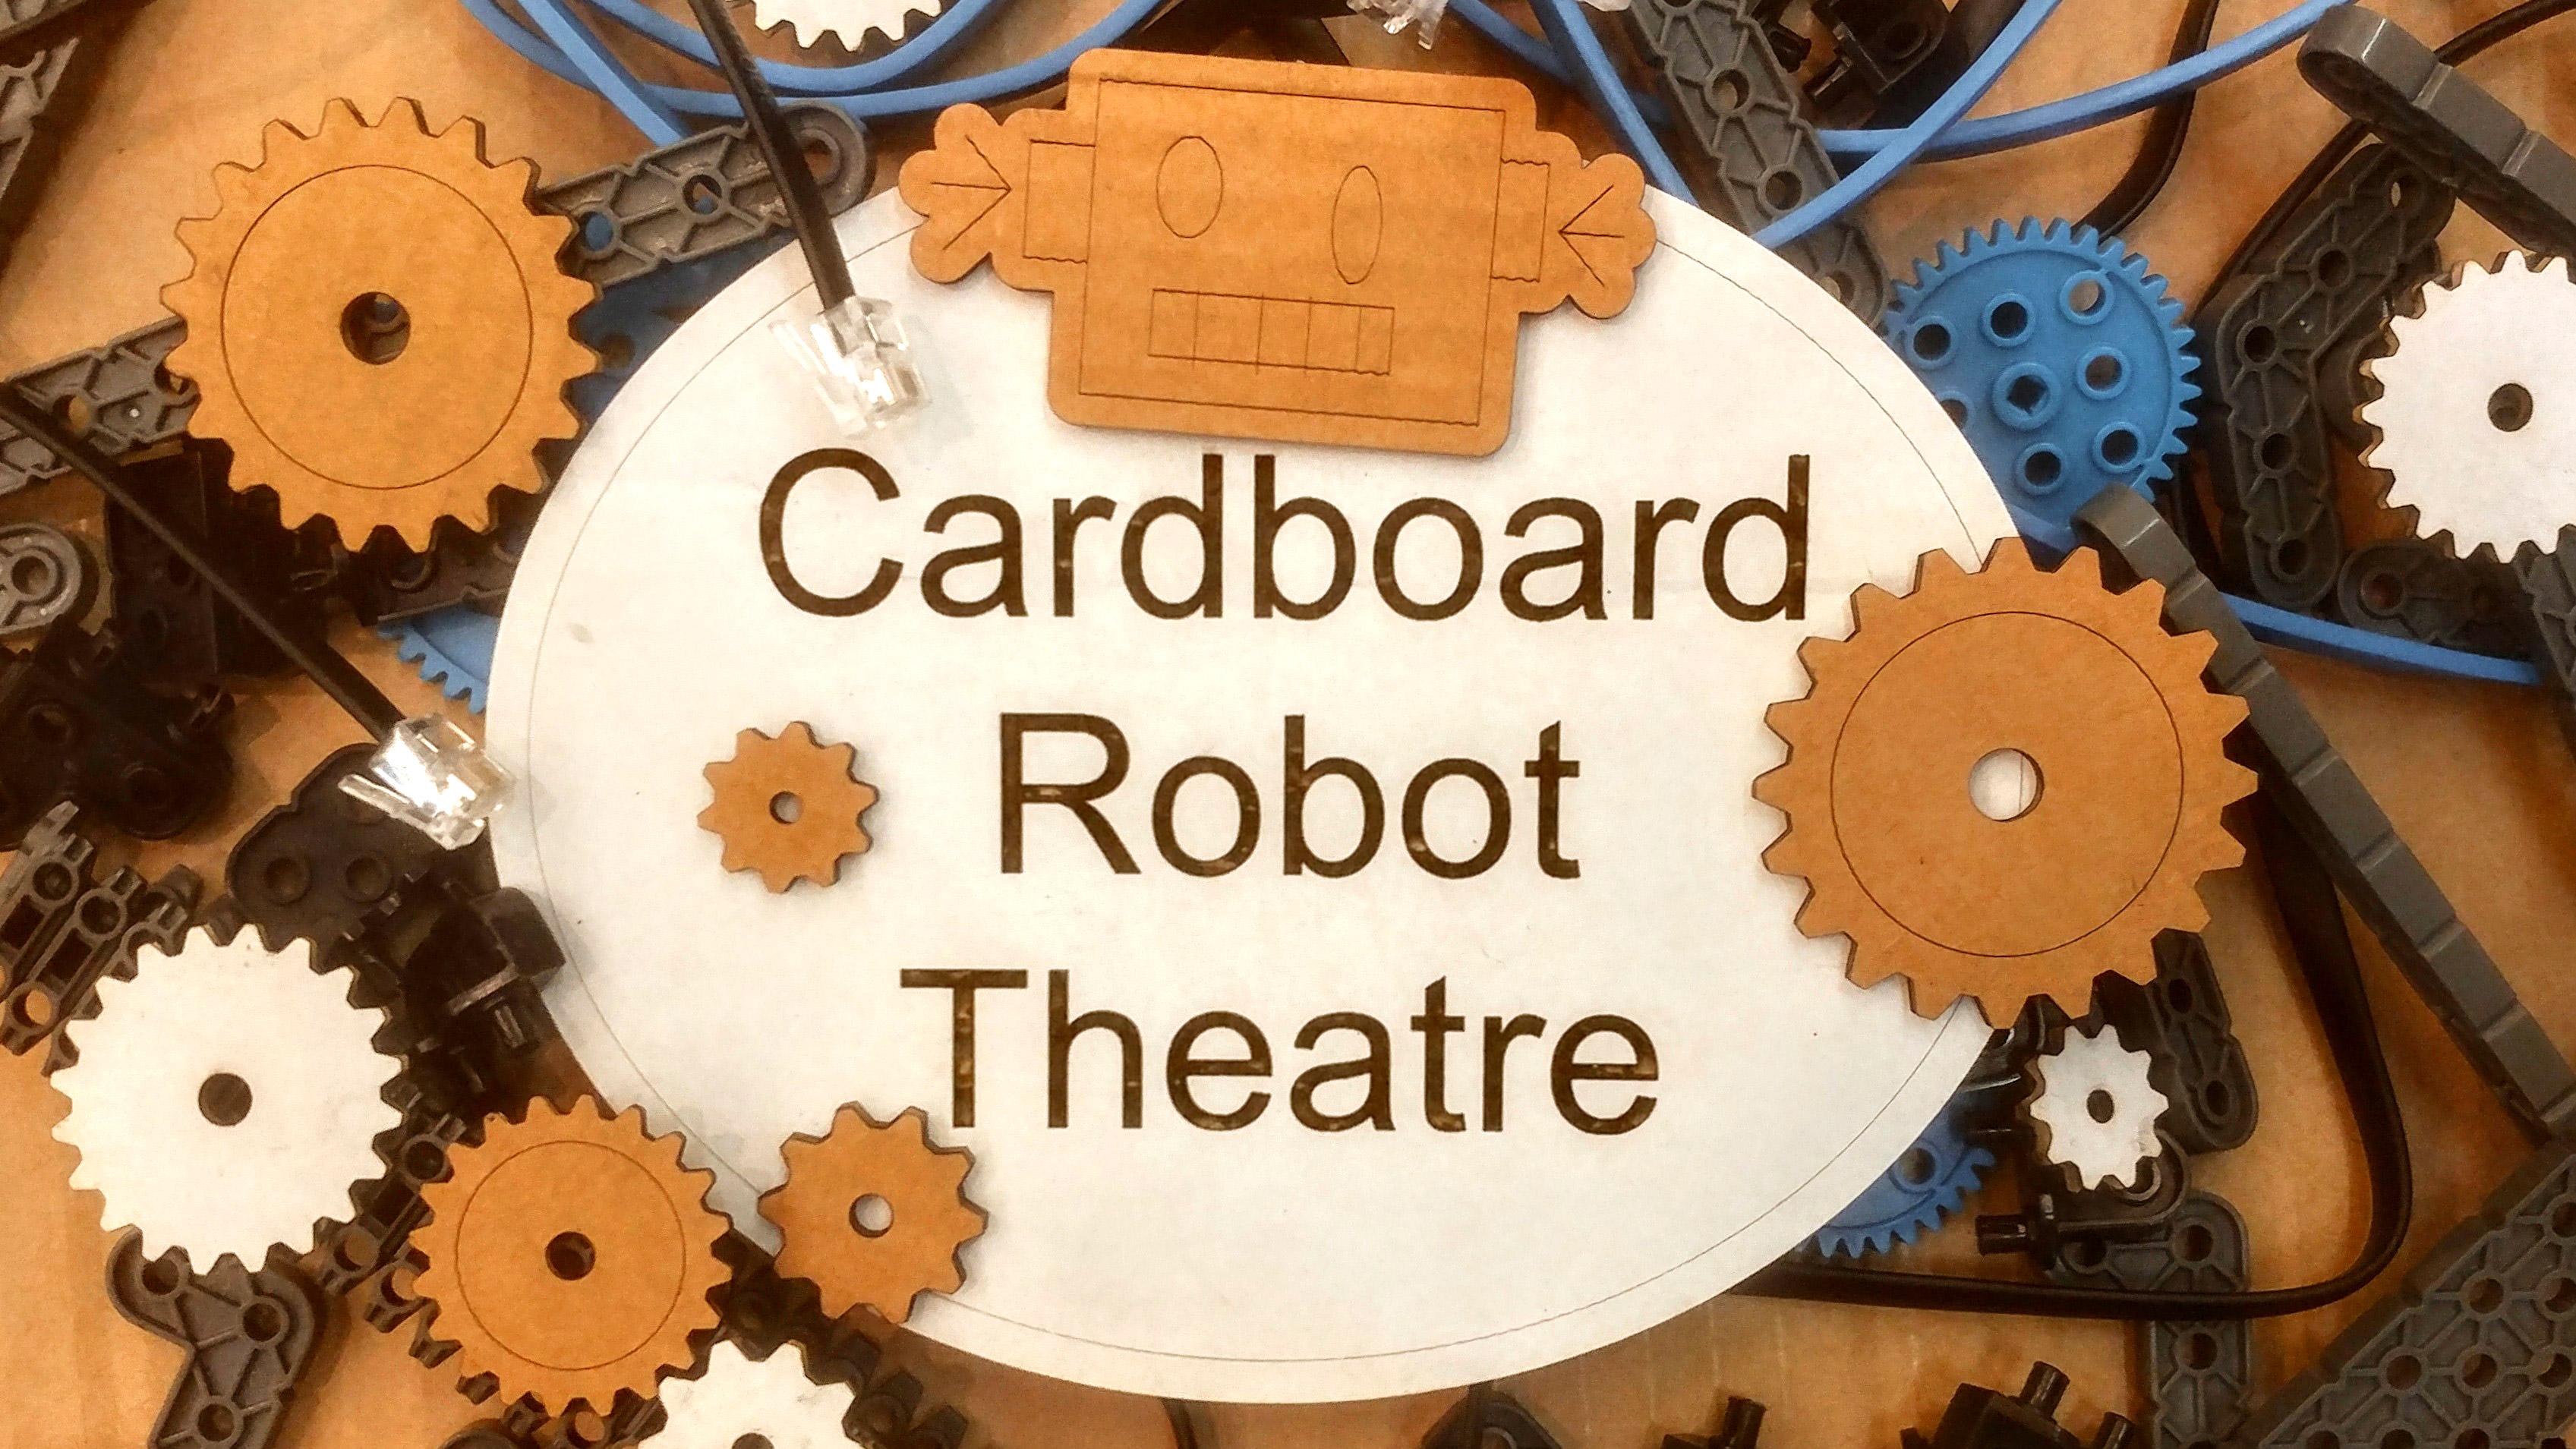 Cardboard Robot Theatre